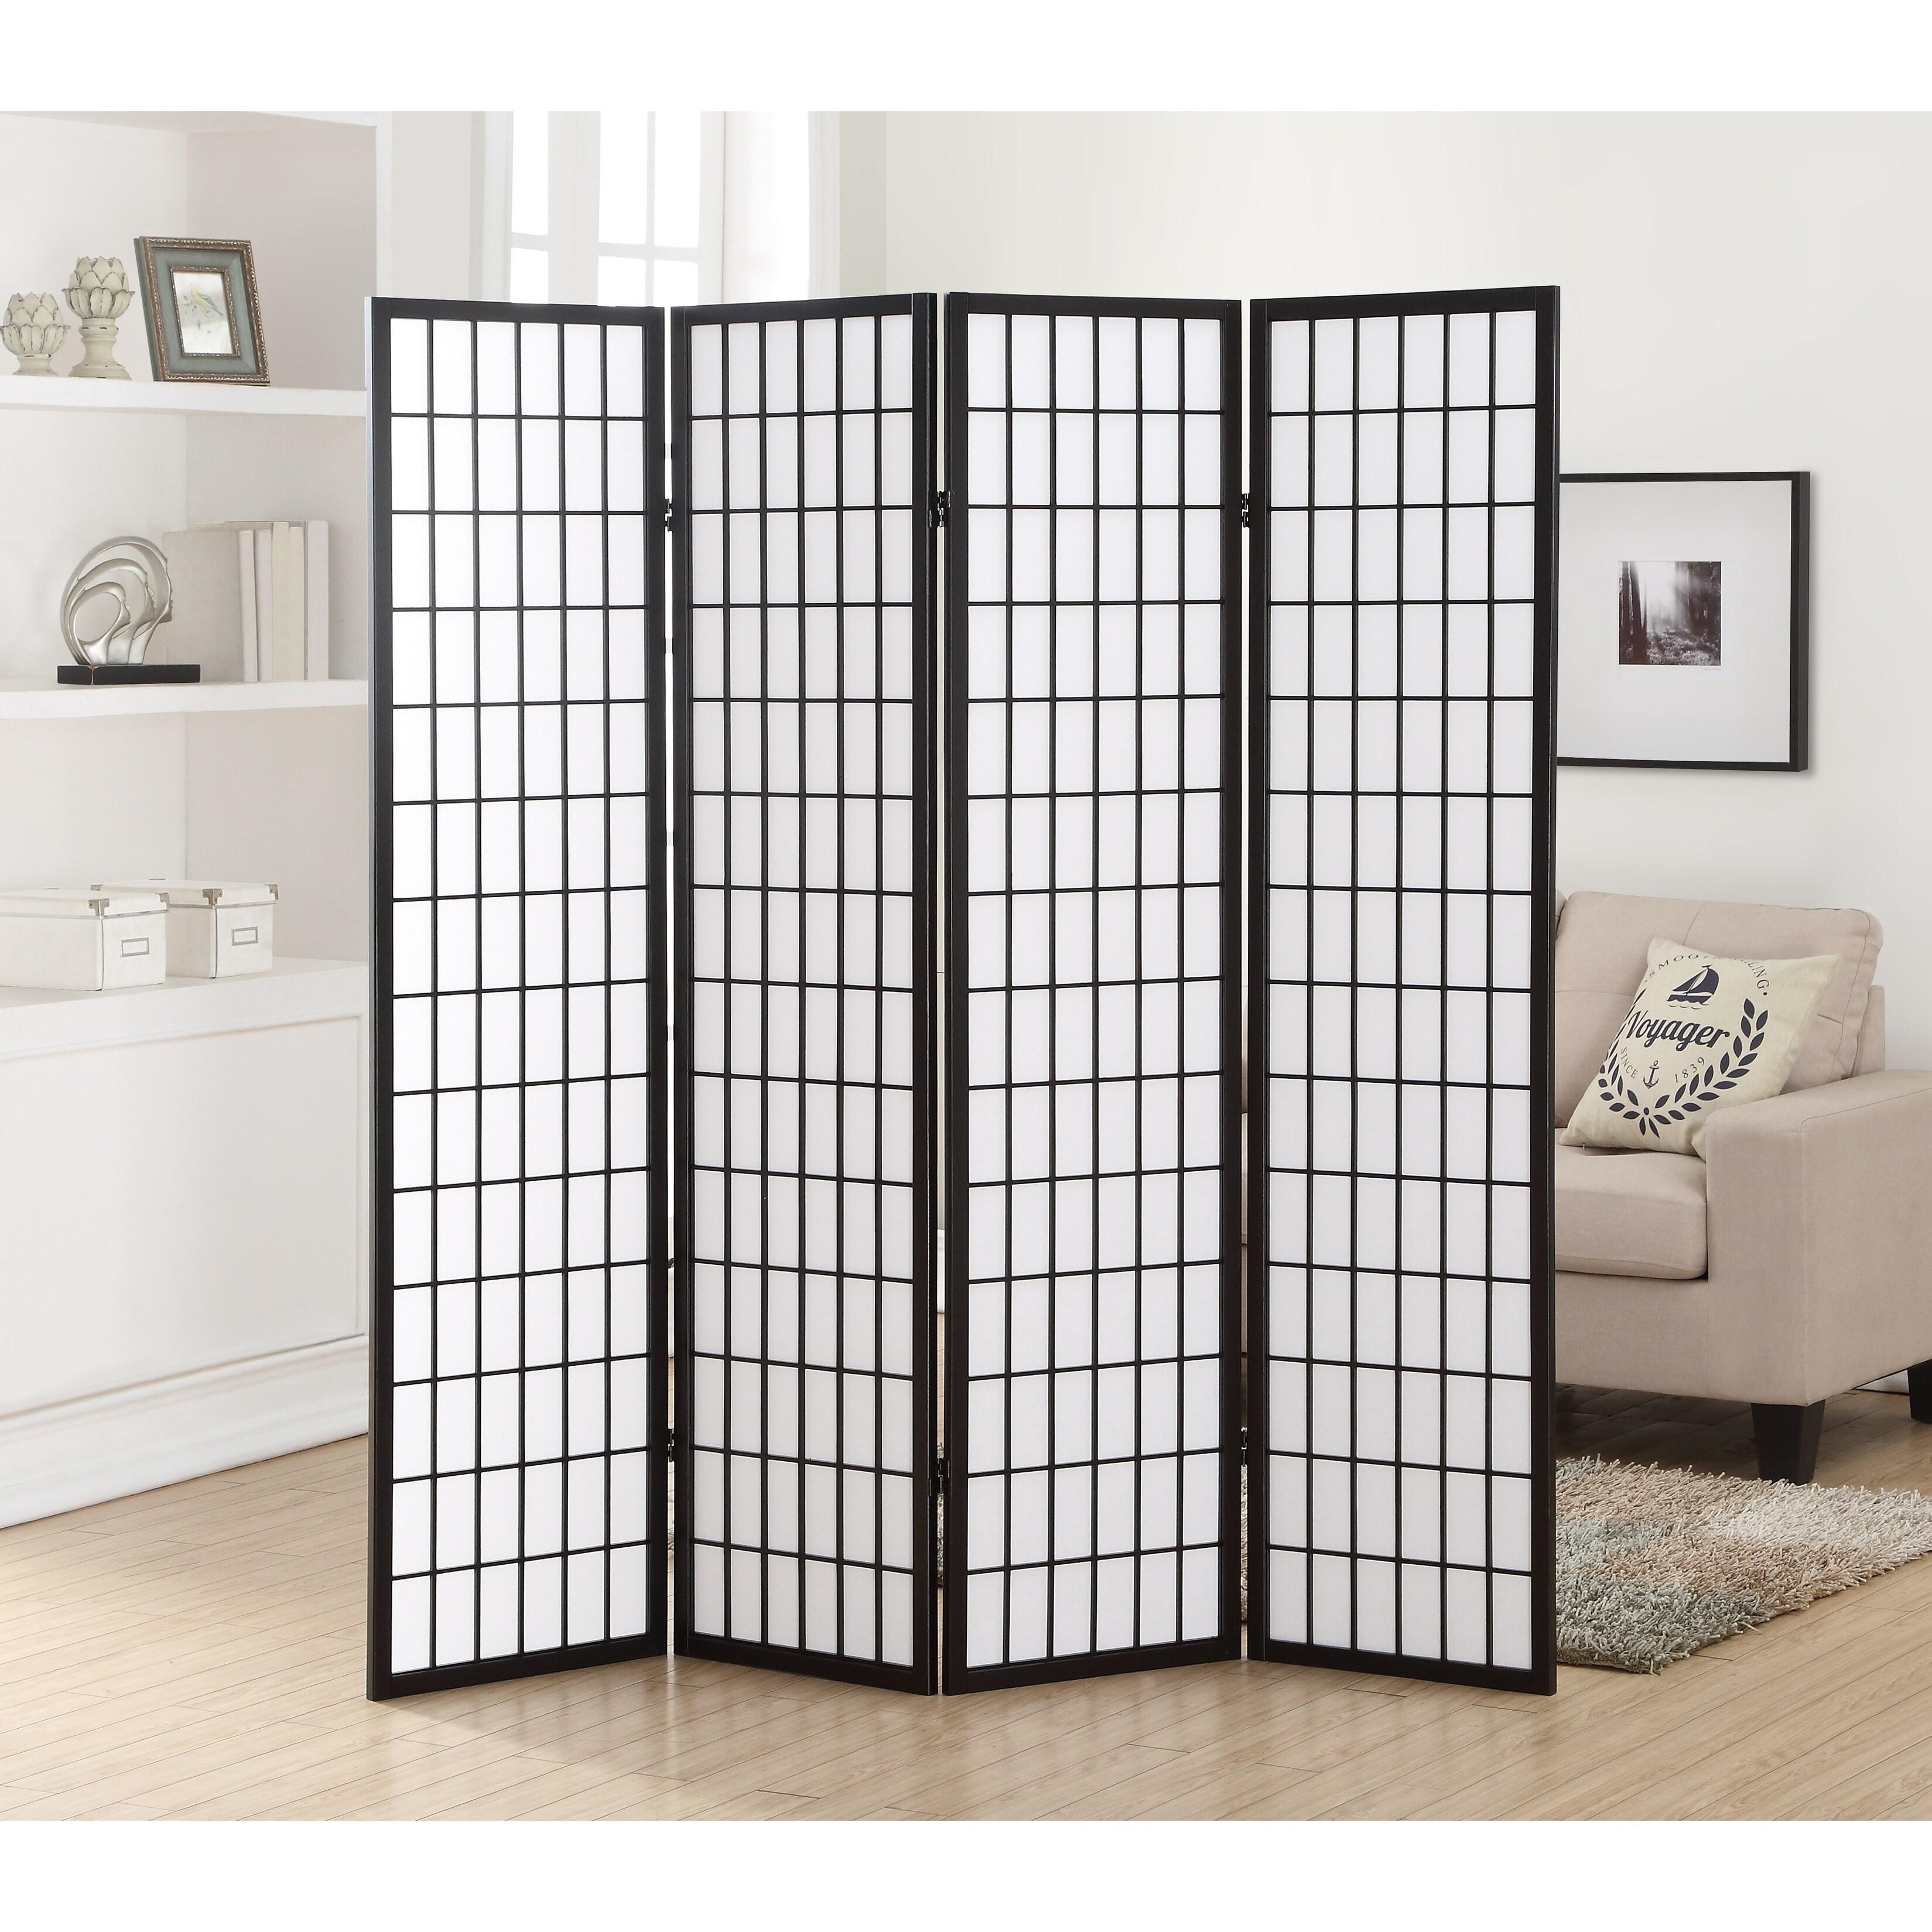 Hoceima Oriental Shoji 4 Panel Room Divider